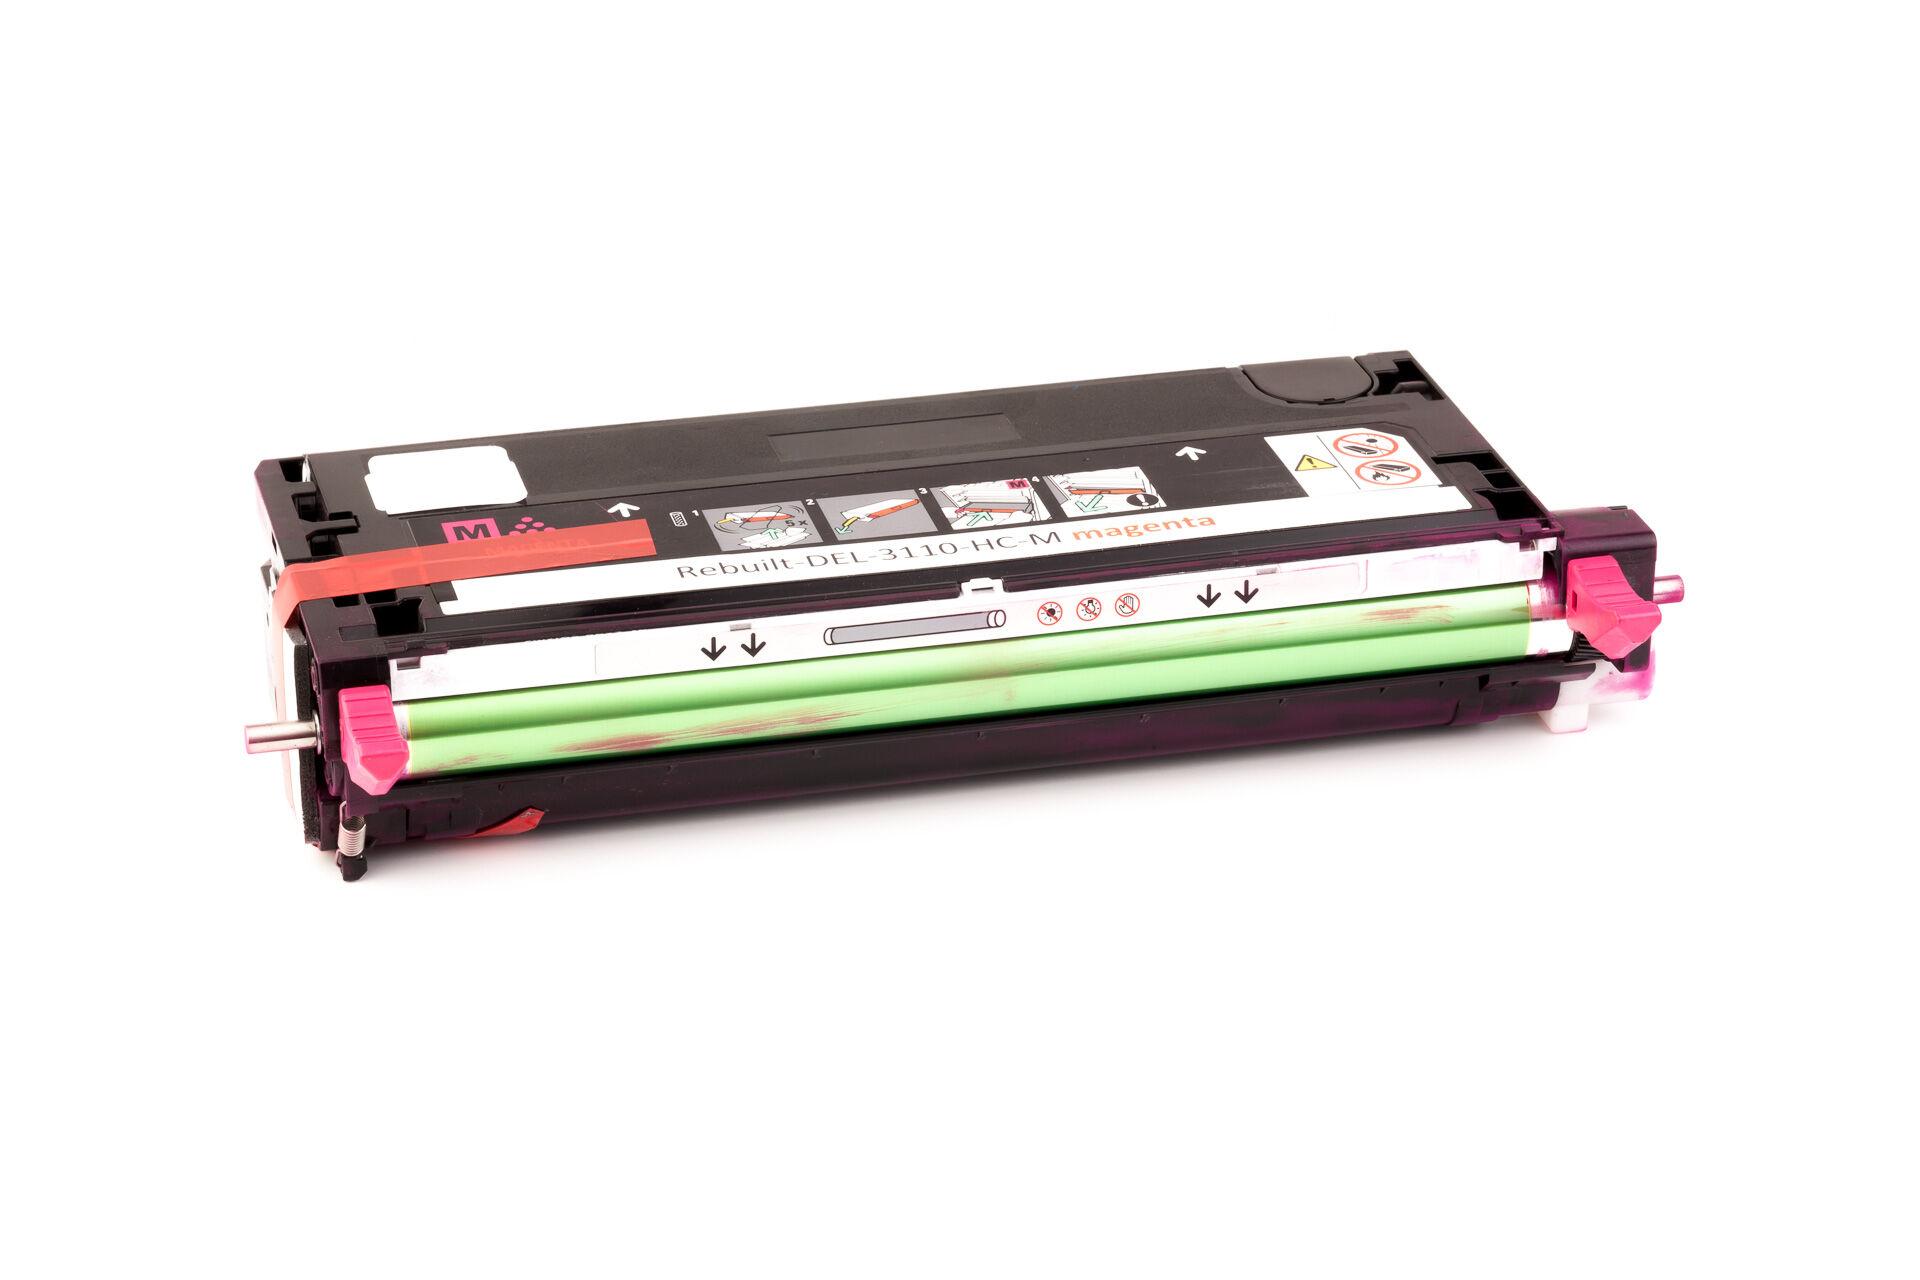 Dell Cartouche de Toner pour Dell 59310172 / RF013 magenta compatible (de marque ASC)